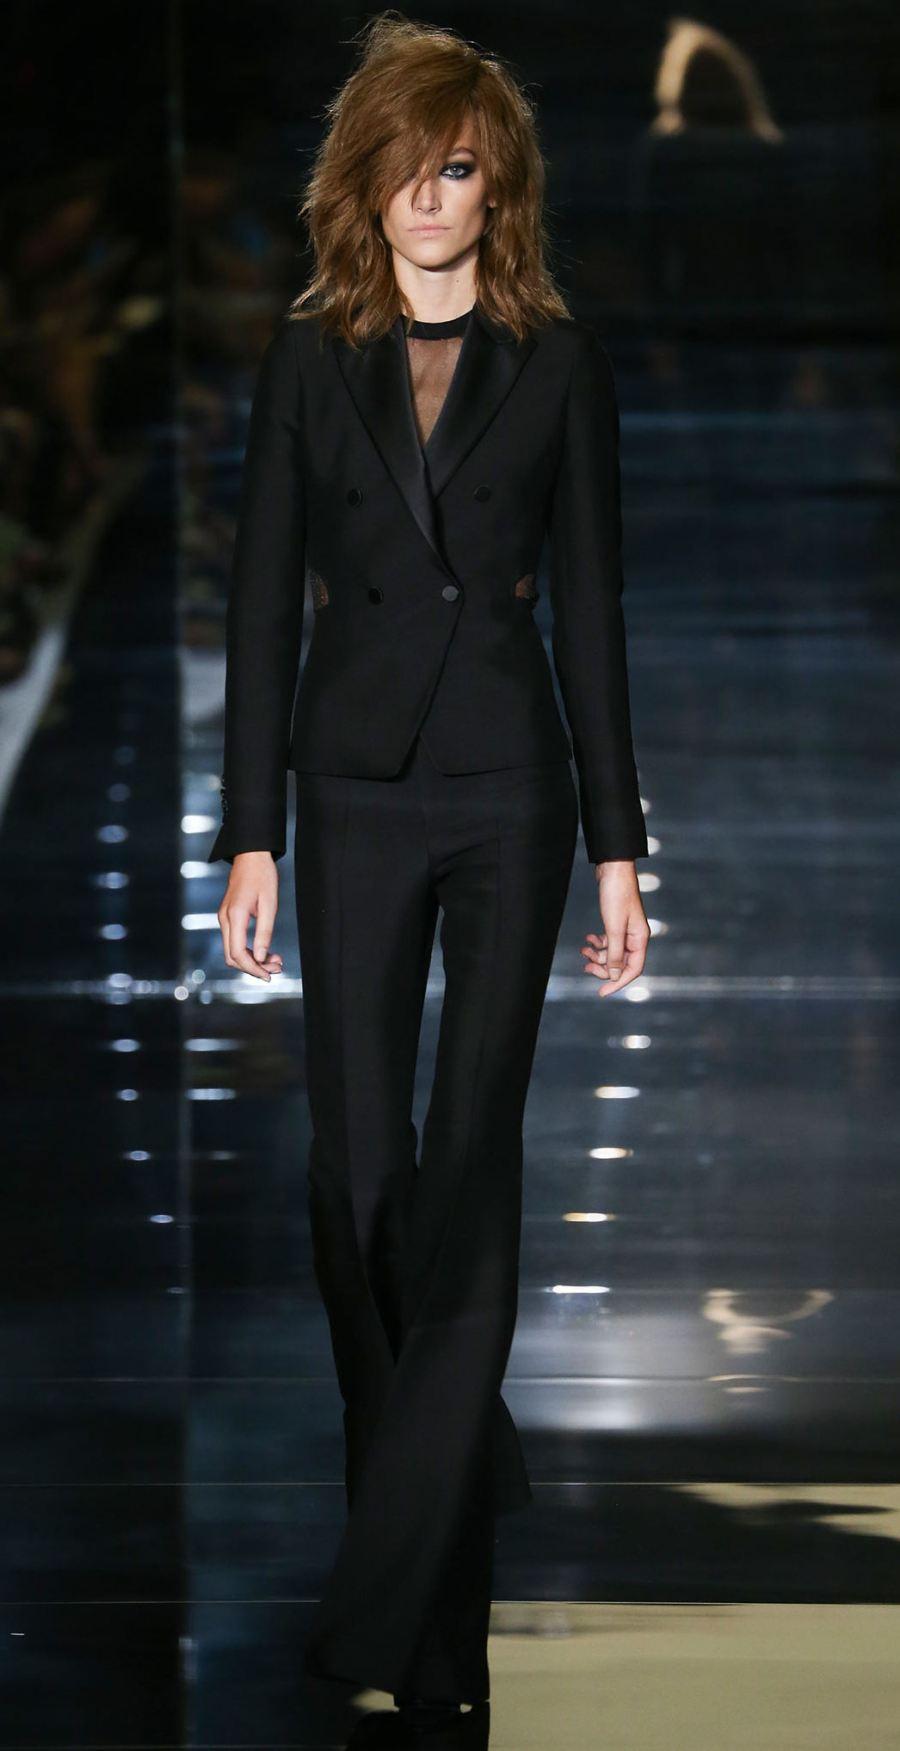 Tom Ford SS15 Black Flared Pant Suit on Exshoesme.com